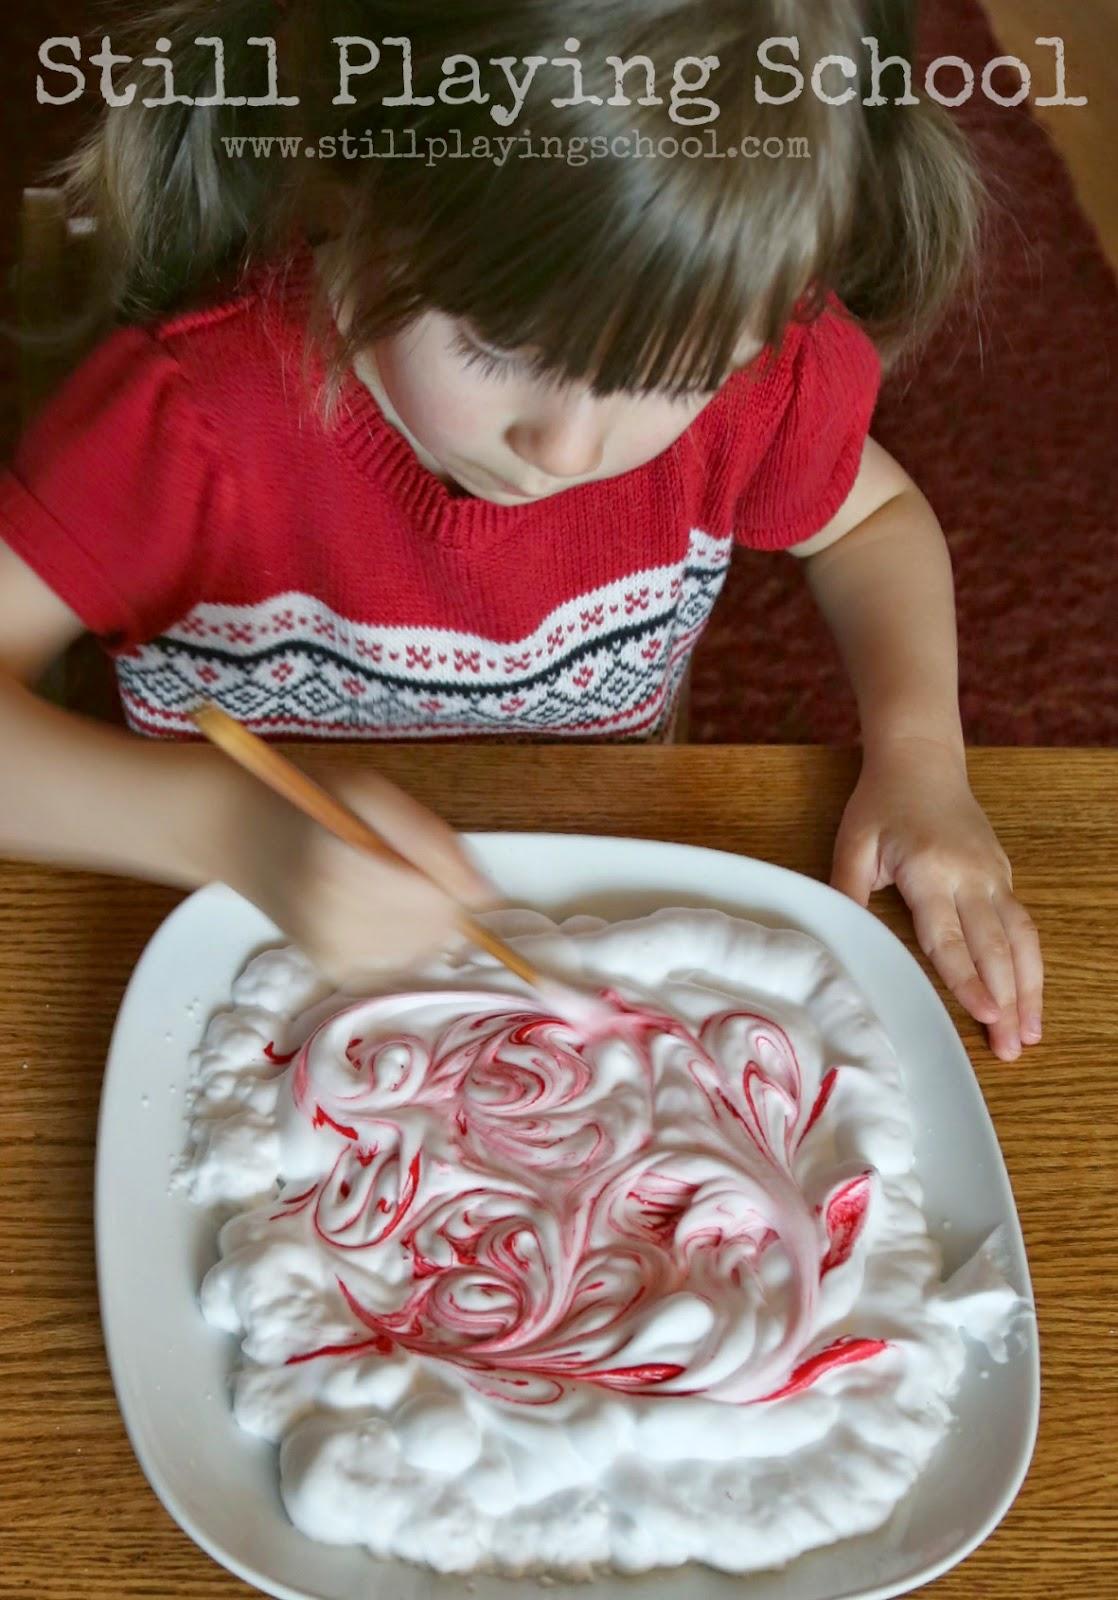 Christmas Sensory Play Ideas For Kids Still Playing School